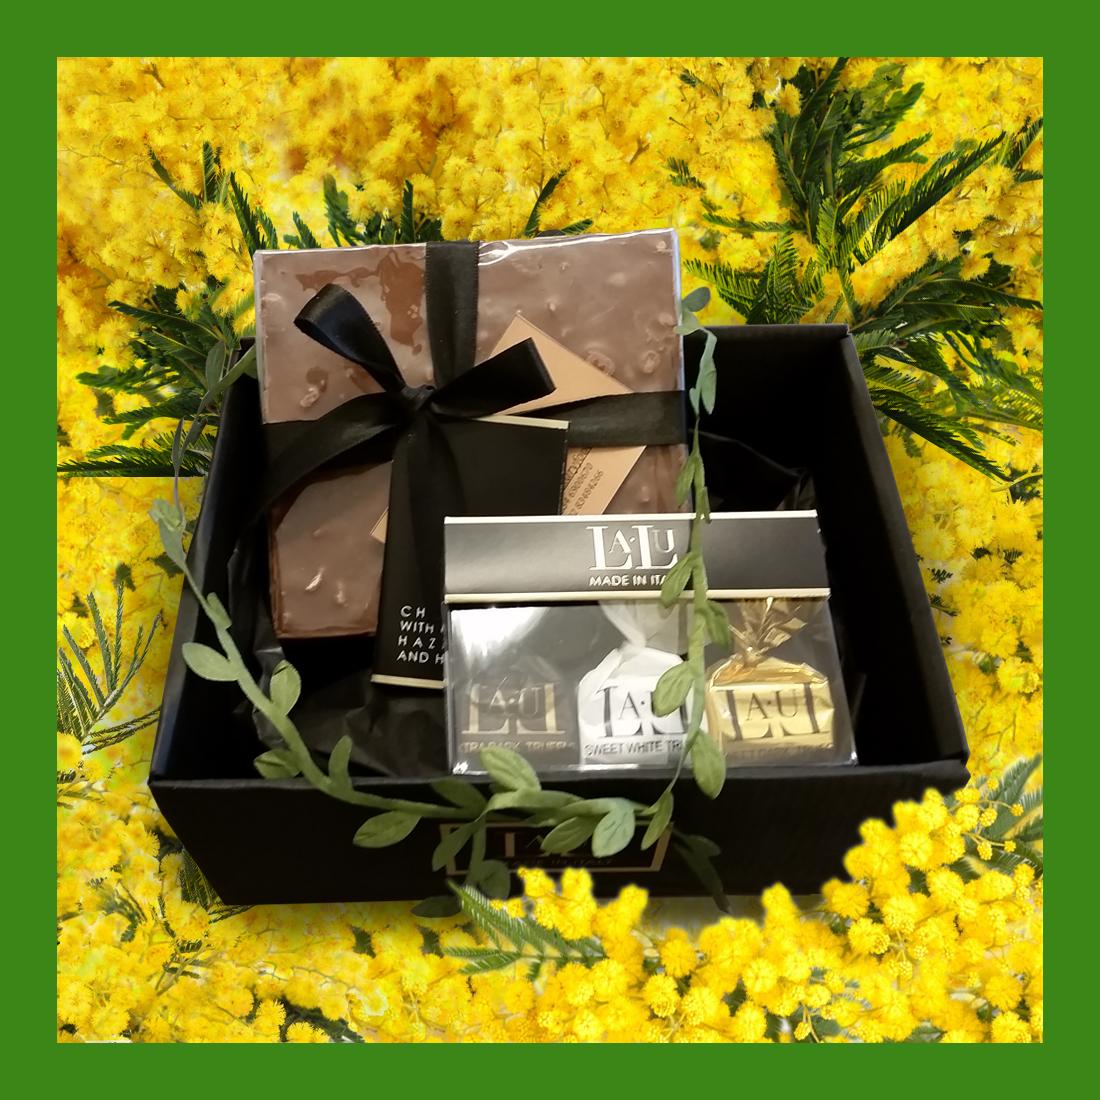 Box degustazione – quadrotta gianduia e tartufi assortiti